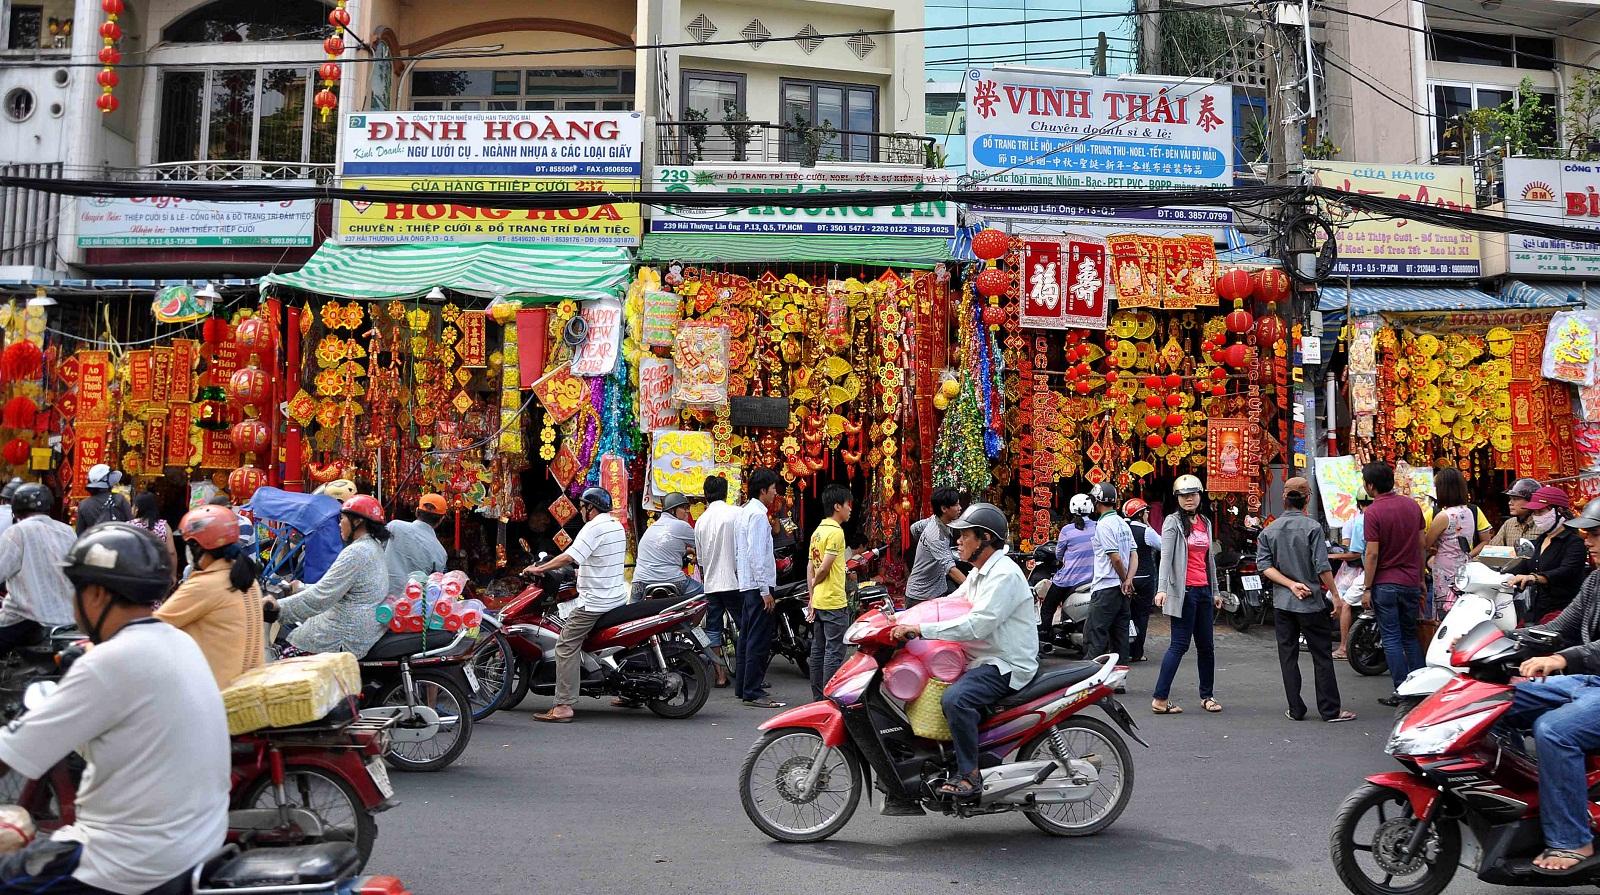 Street in Cholon - Saigon